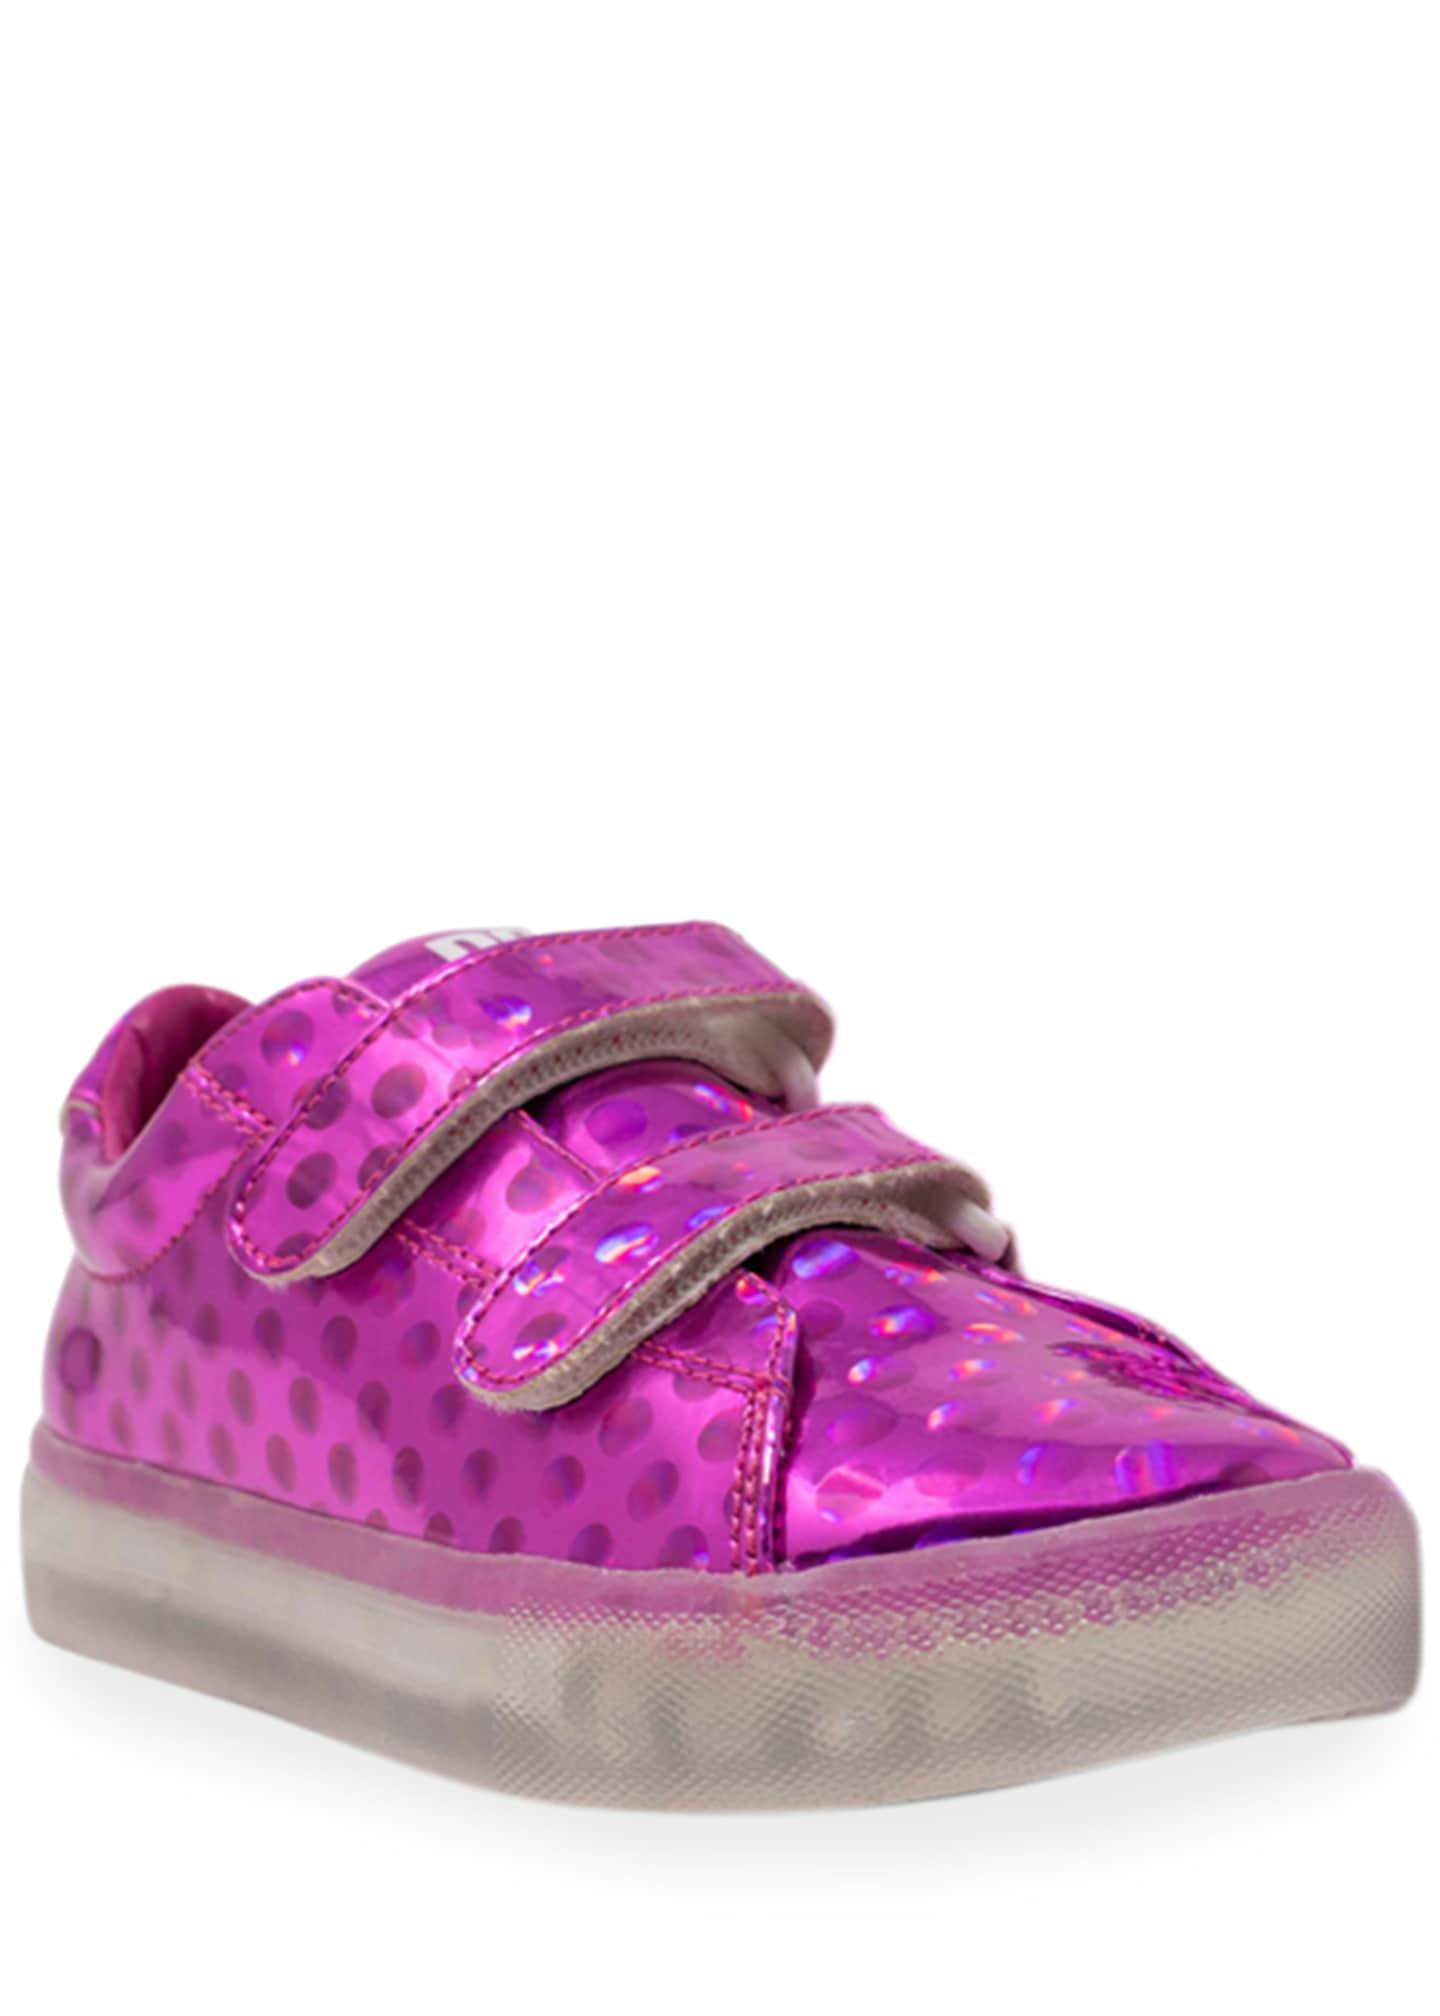 Pop Shoes EZ Dots Metallic Light-Up Sneakers, Toddler/Kids